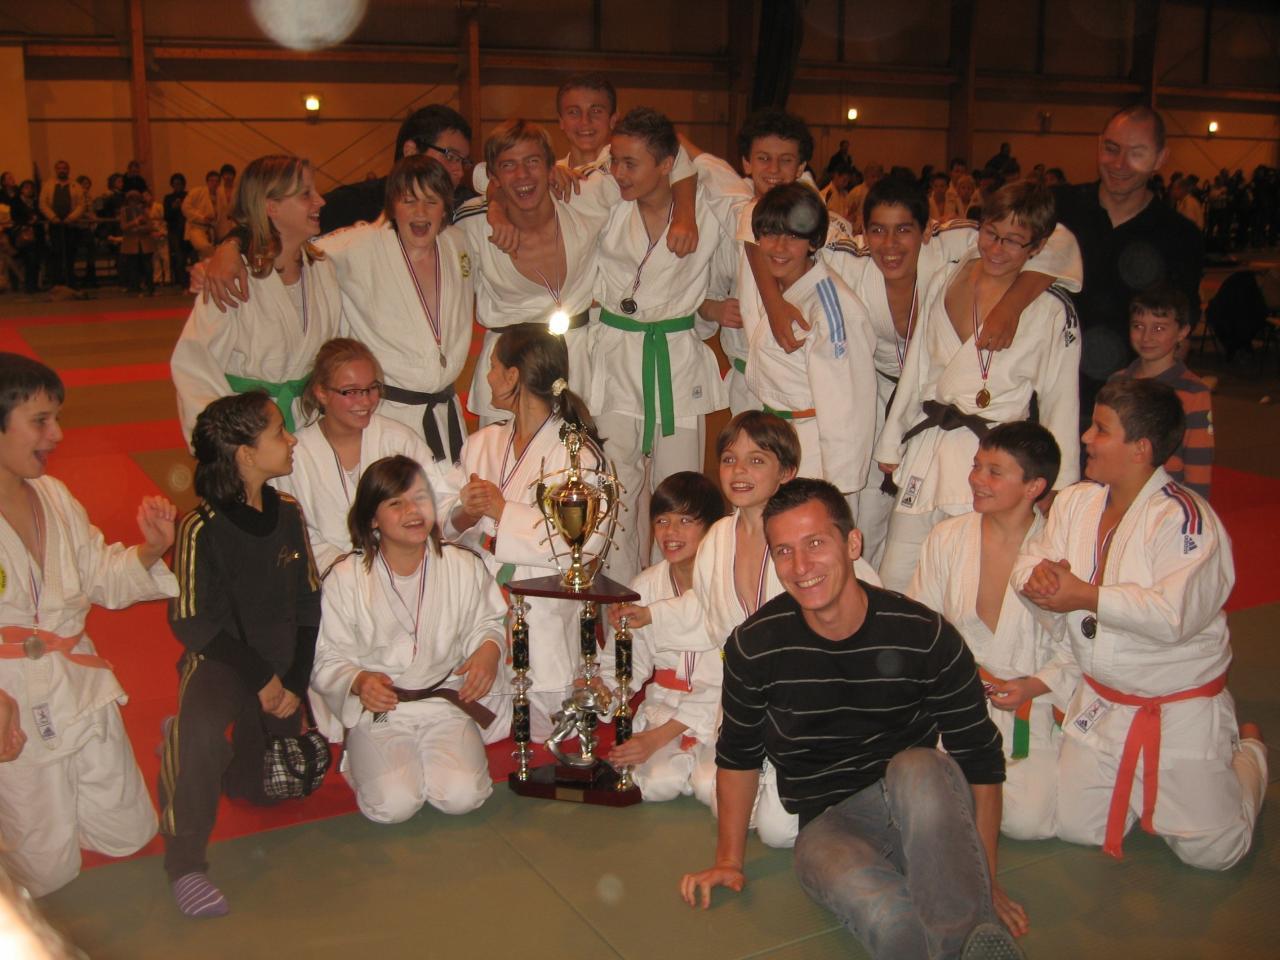 Witry - déc 2012 Couvrot 1er